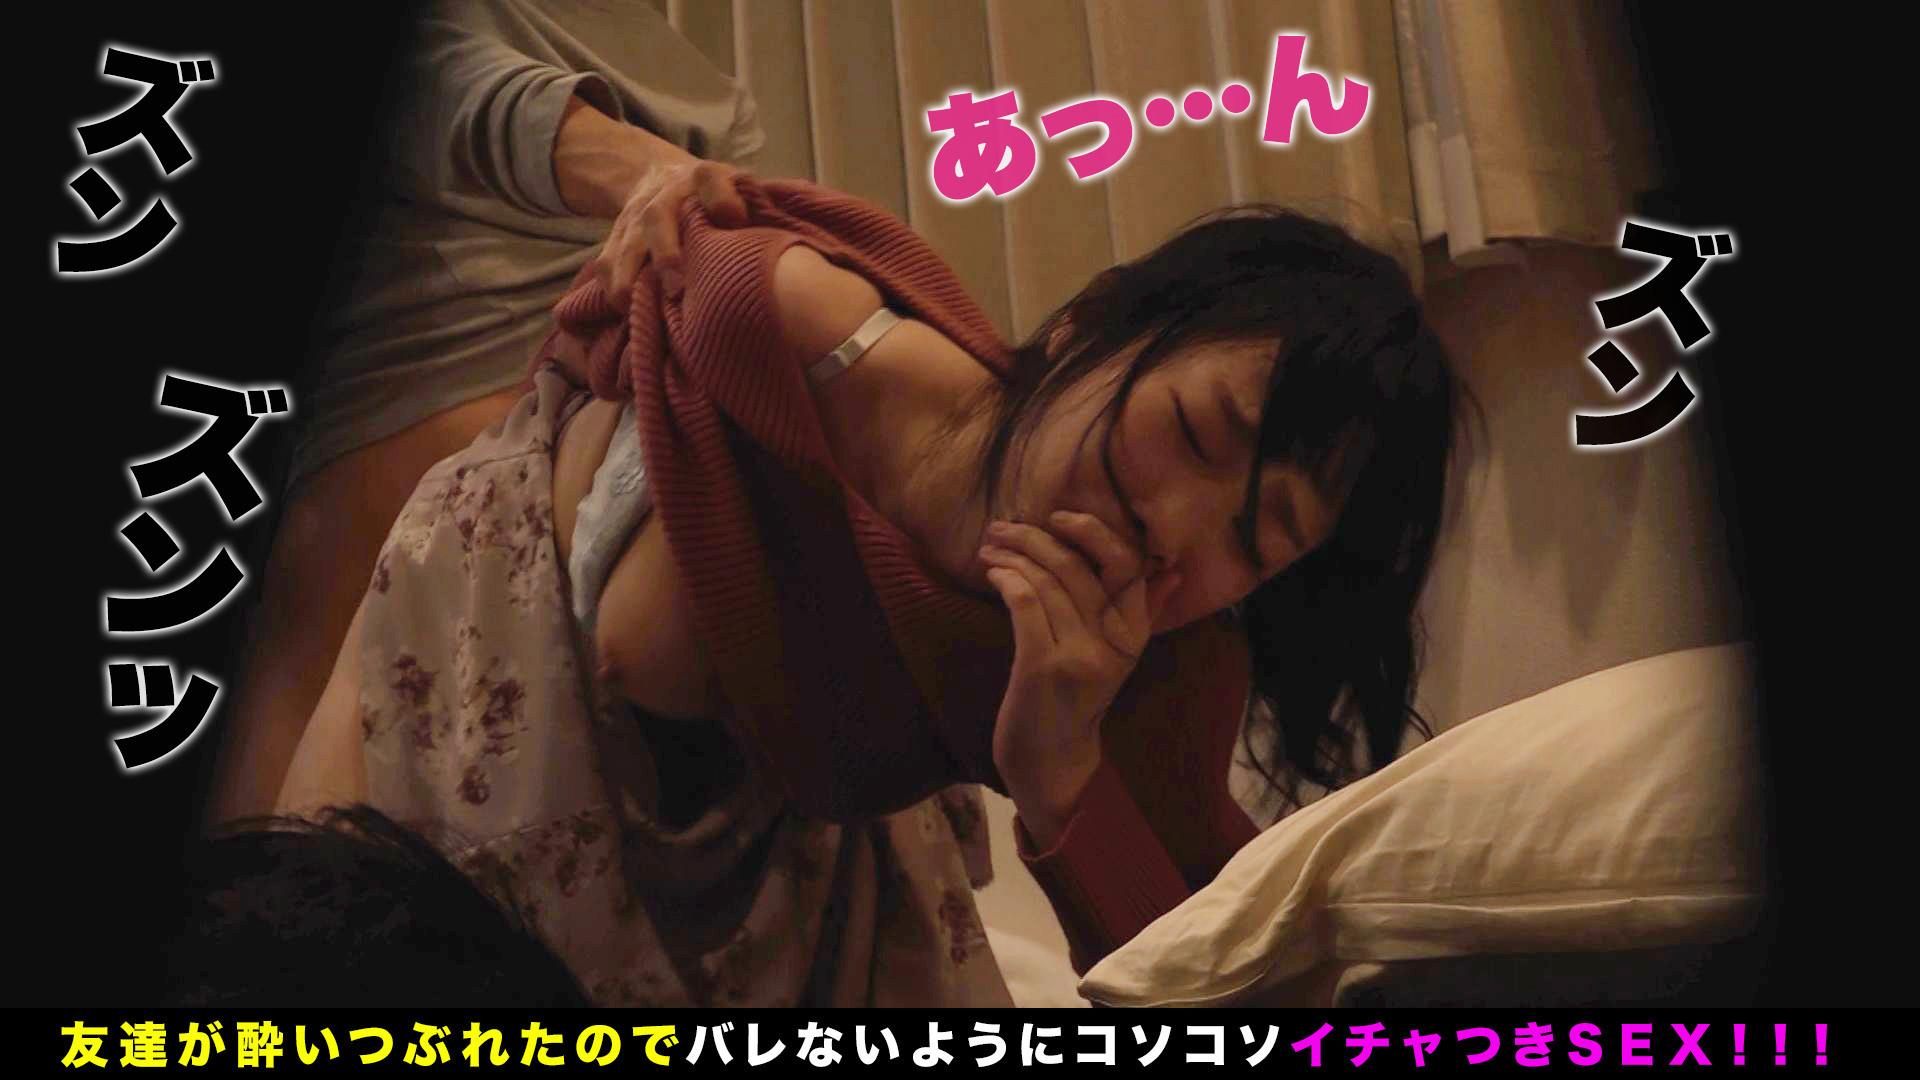 【NTR】むっちりデカ尻&G乳を彼氏の目の前で寝取る・・・宅飲みで酔い潰れて雑魚寝してしまった友達とその彼女【盗撮】